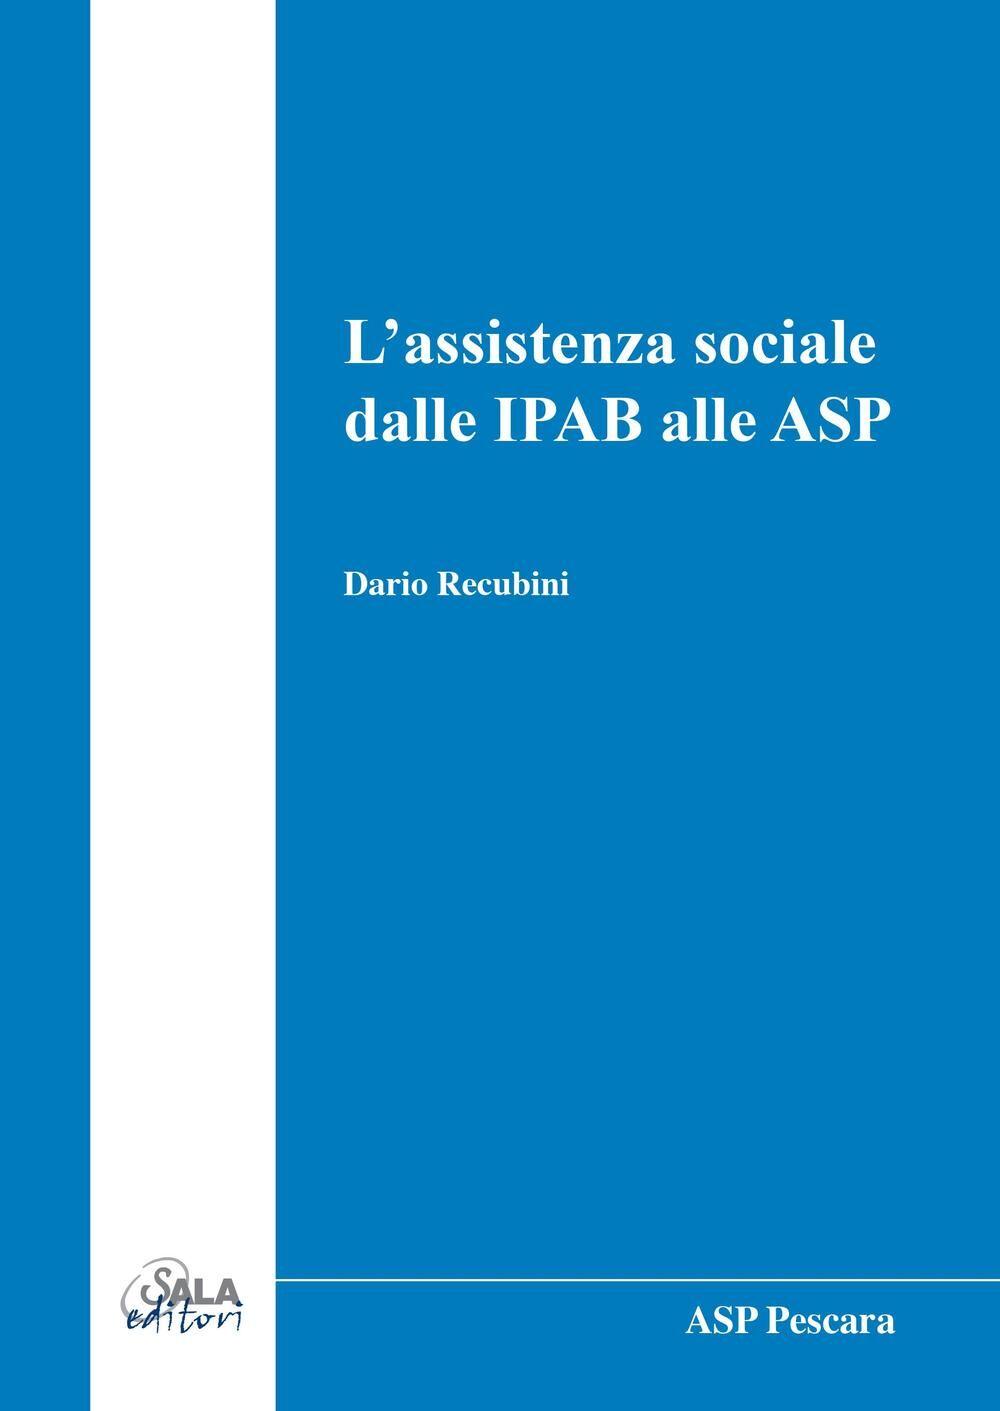 L' assistenza sociale dalle IPAB alle ASP